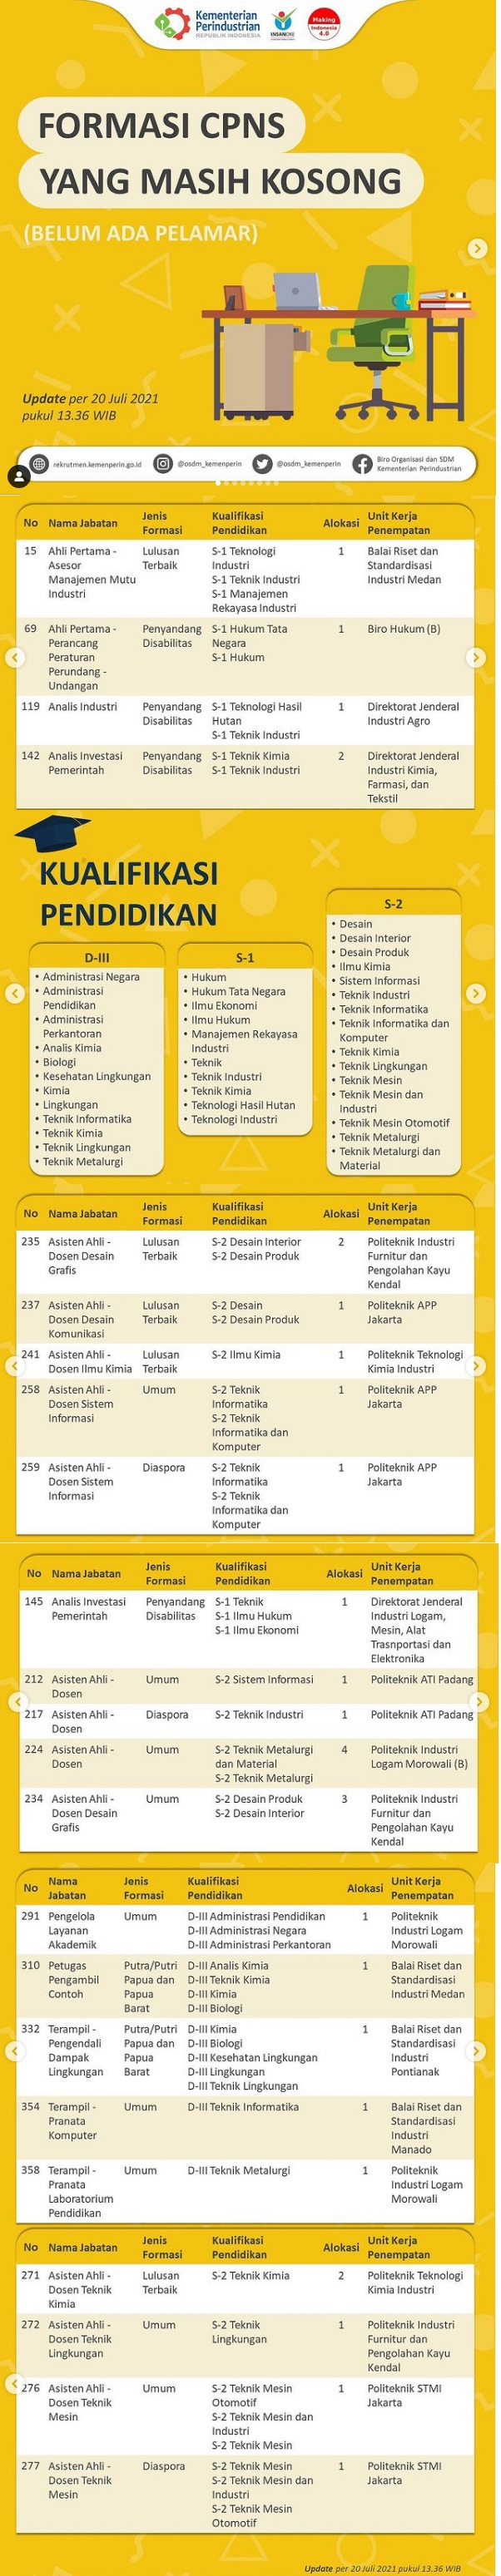 Daftar Posisi Jabatan CPNS Kementerian Perindustrian yang masih kosong pelamar dan formasi Kurang Pelamar